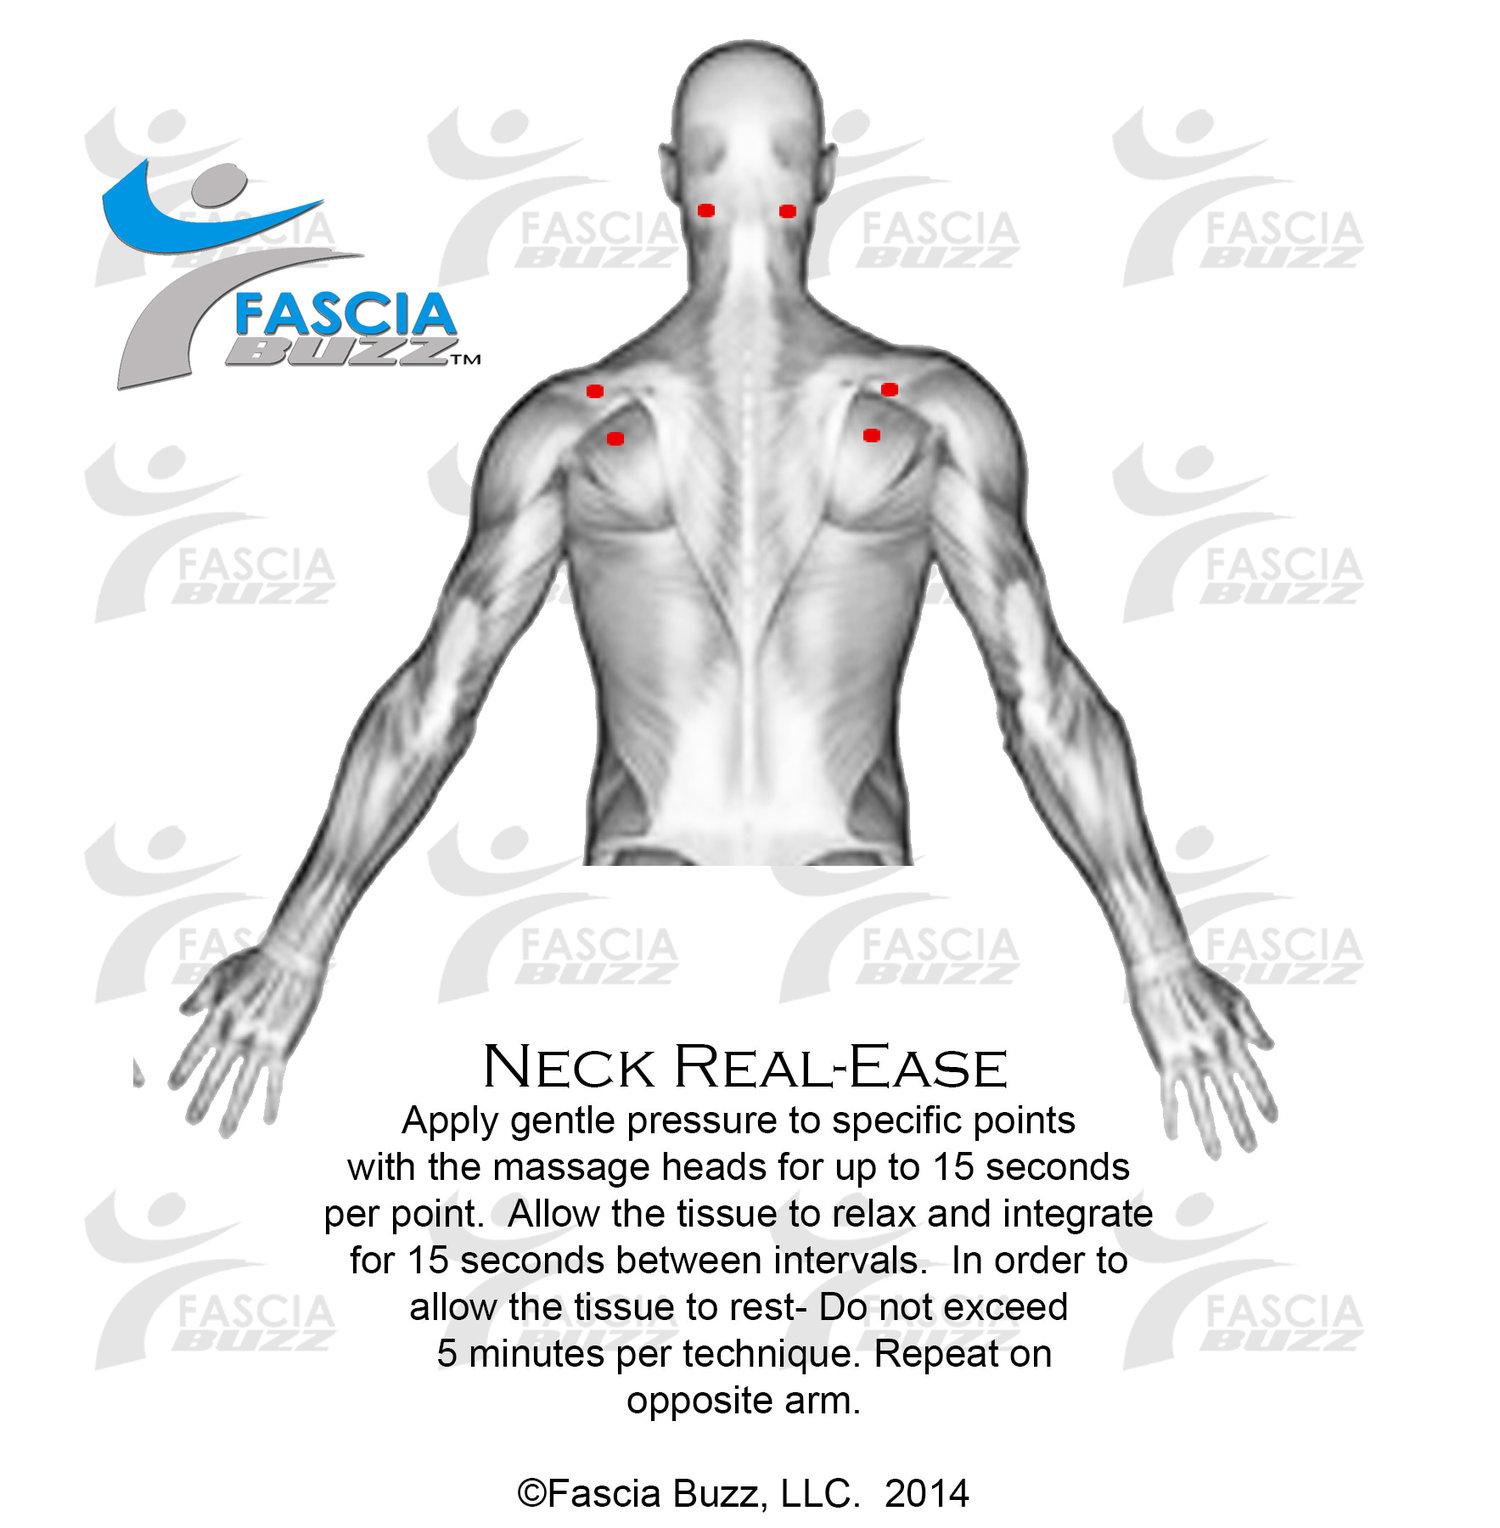 real-ease_neck.jpg